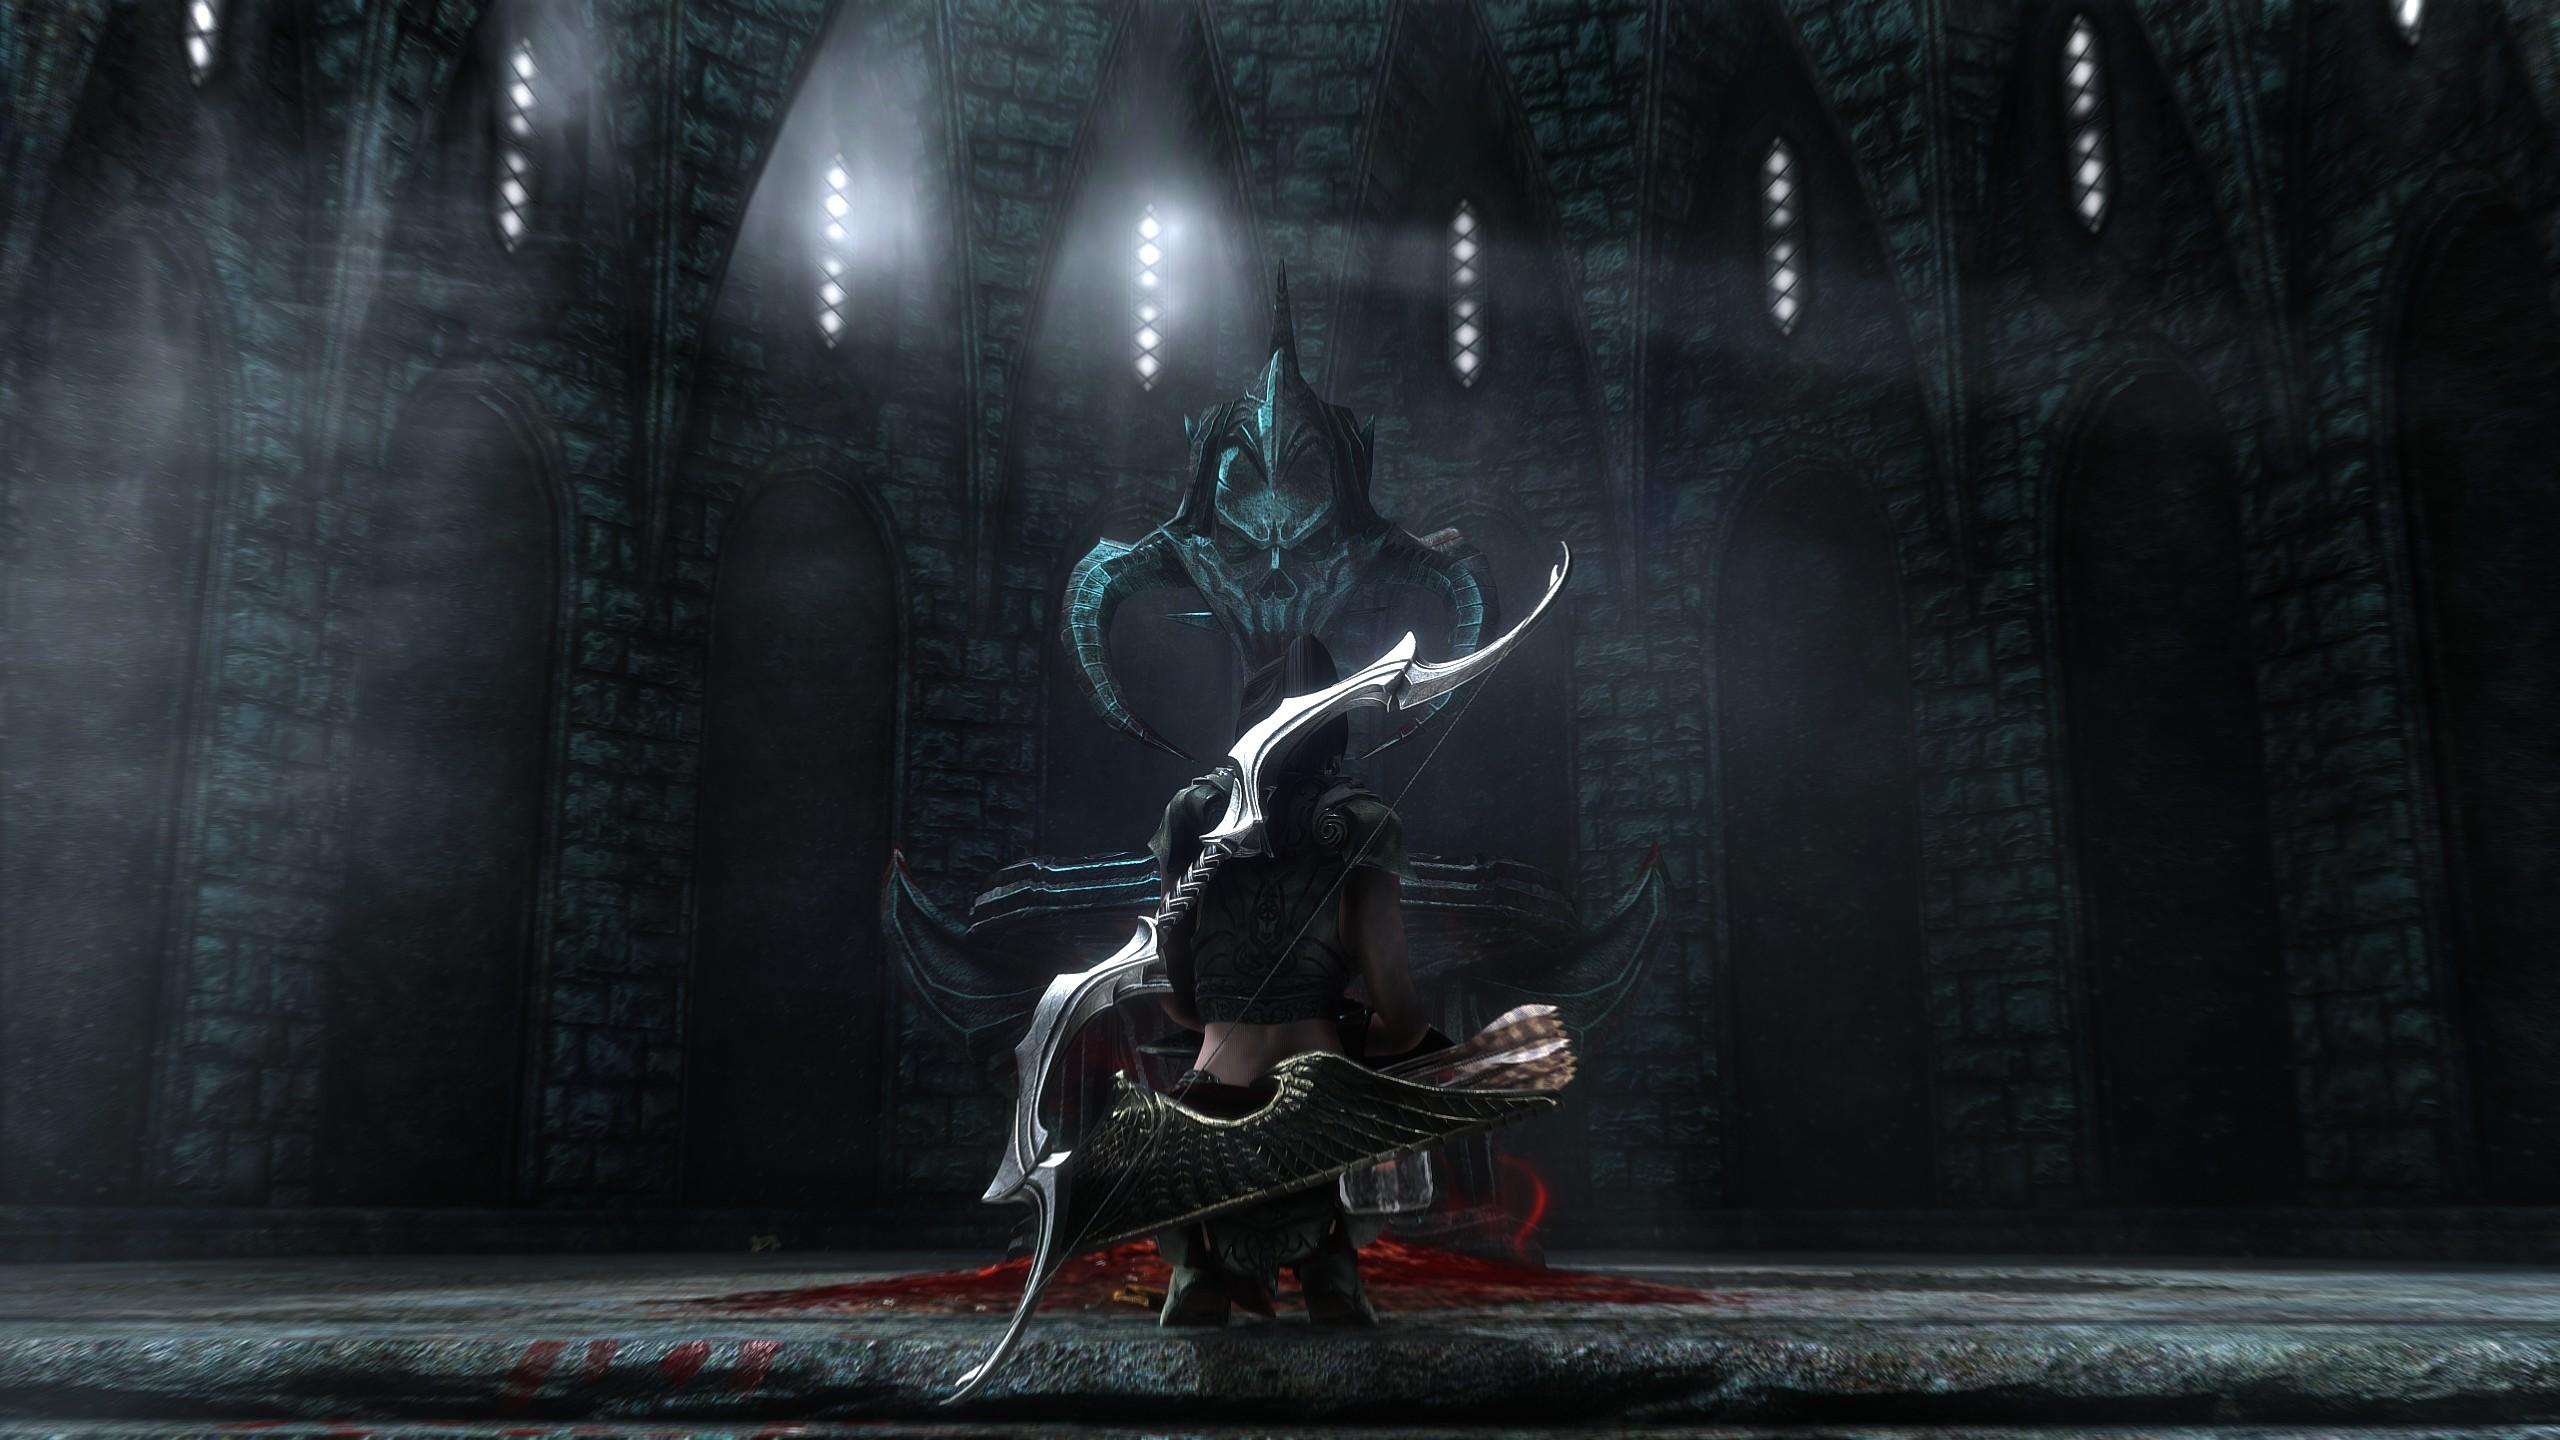 Wallpaper The Elder Scrolls V Skyrim Bow And Arrow Video